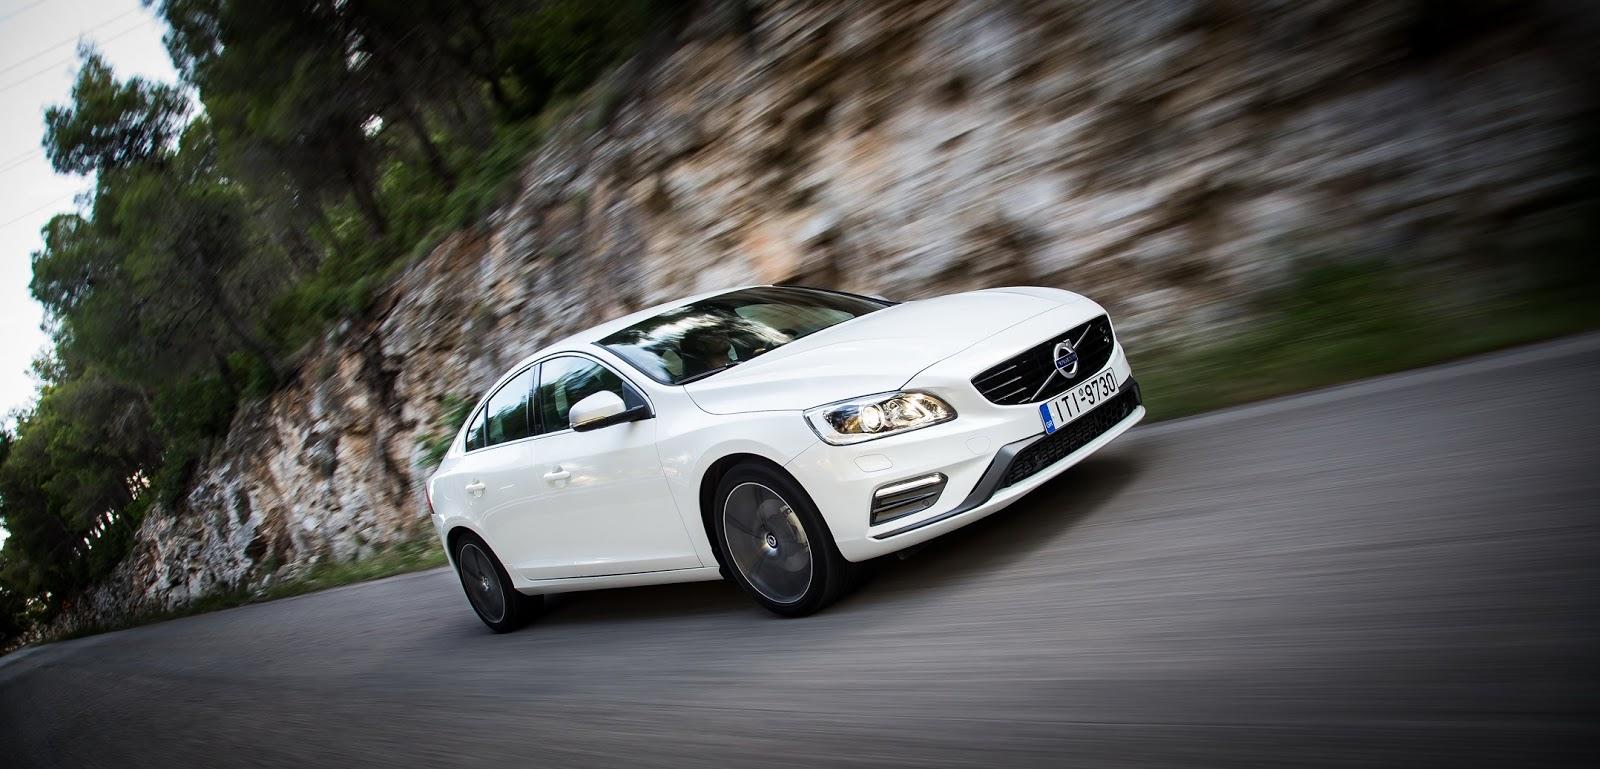 VOLVO2BS602BT32B1.52BAUTO 4 10 σημεία που κάνουν τα Volvo S60 και V60 την πληρέστερη πρόταση premium sedan, sedan, Station Wagon, Volvo, Volvo Car Hellas, Volvo Cars, Volvo S60, Volvo V60